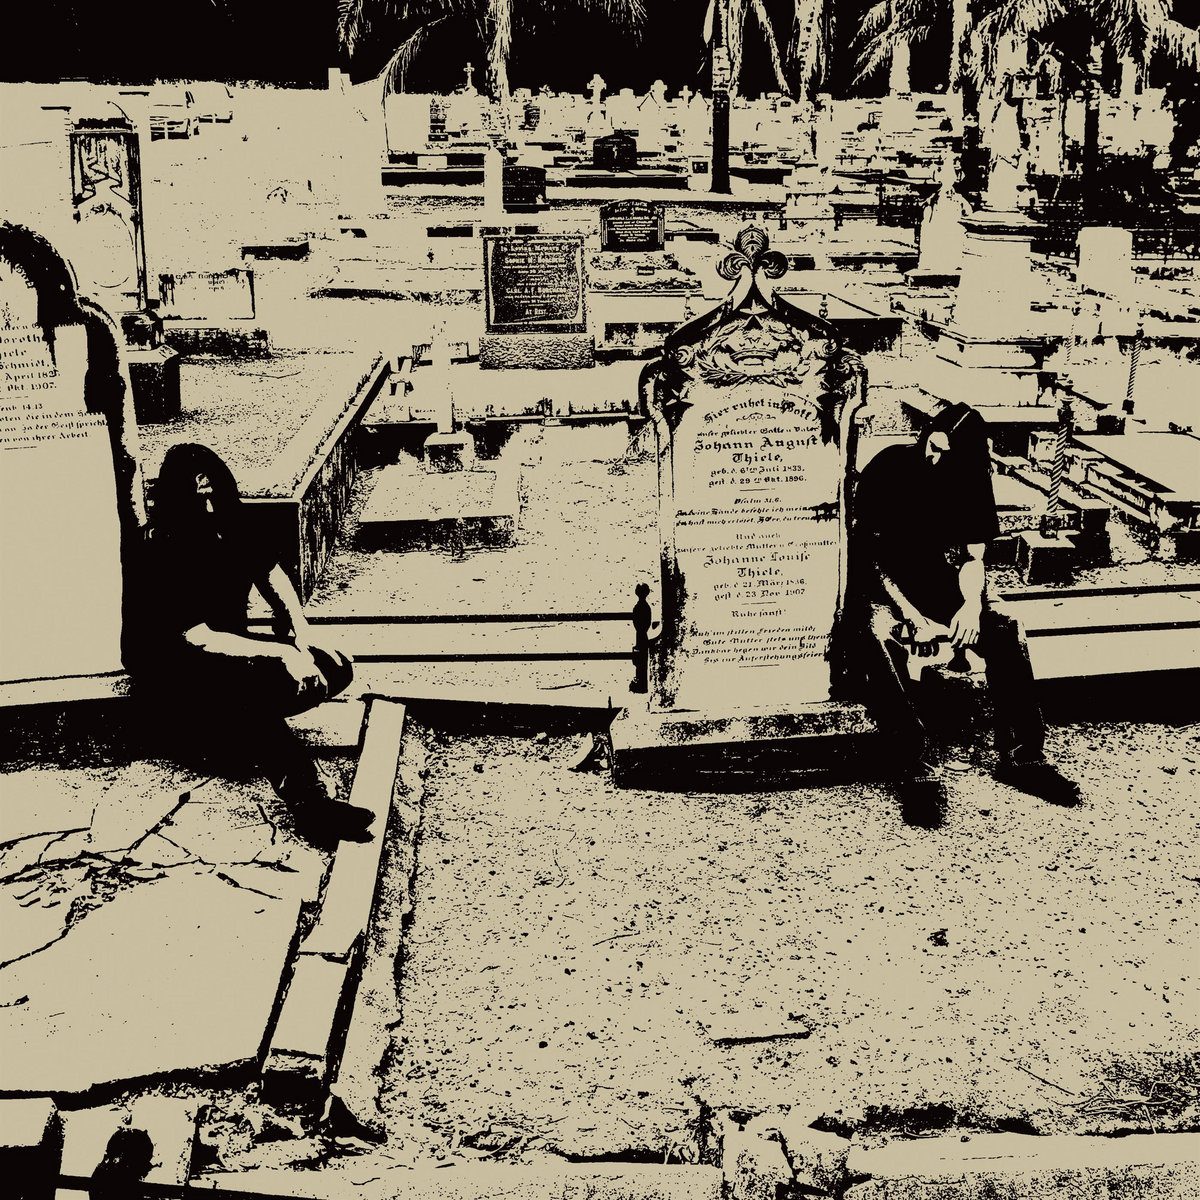 Lucifer's Fall (Hammerheart Re-release)